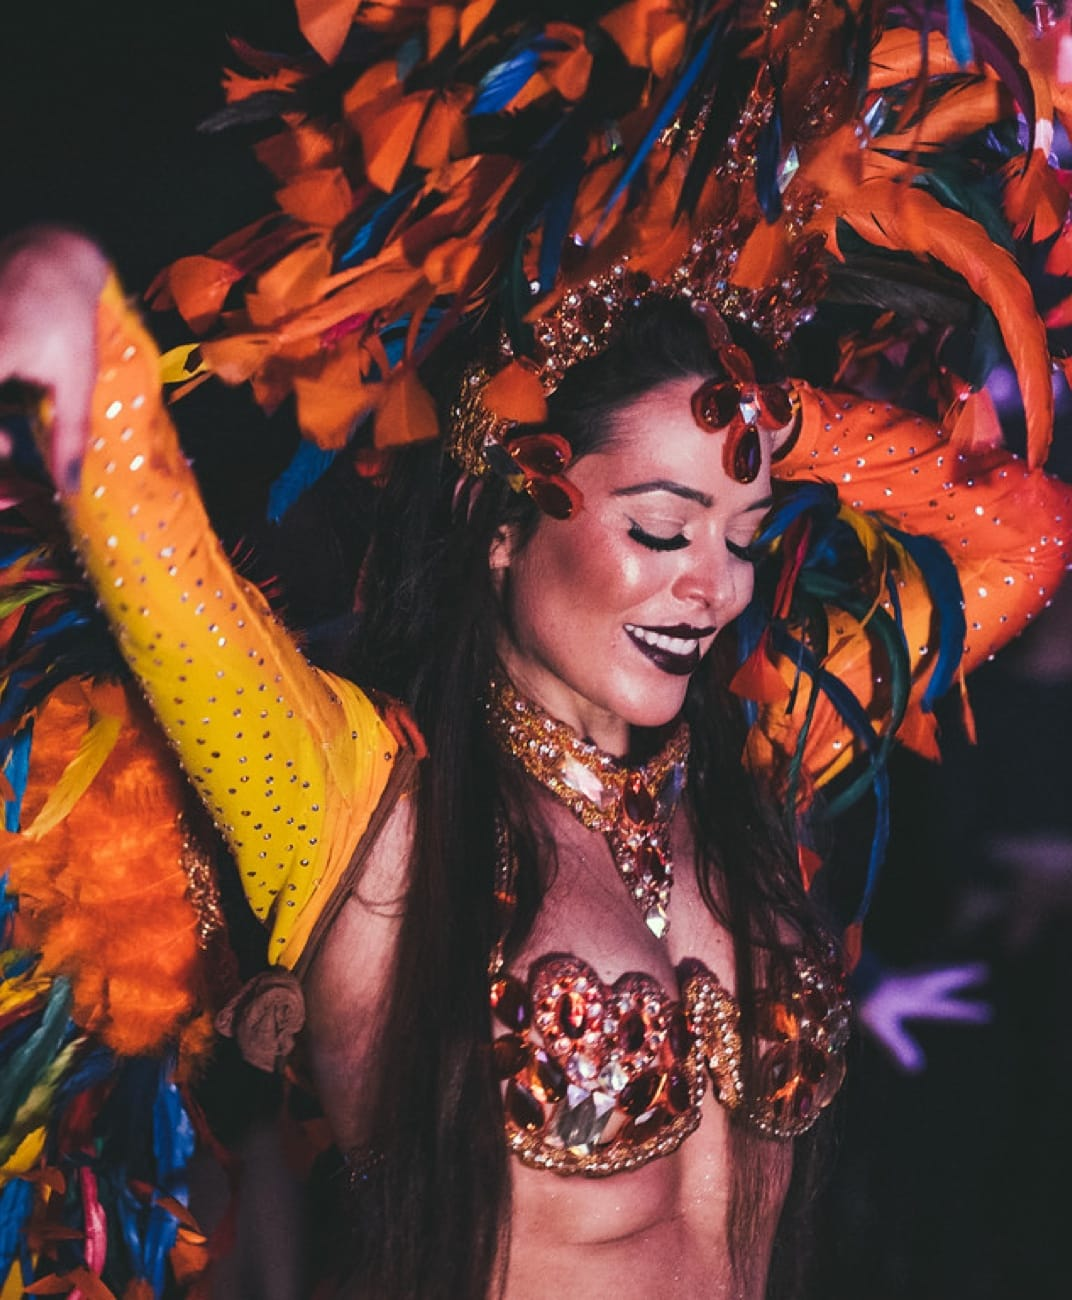 The 8 best carnivals in the world - Revolución de Cuba